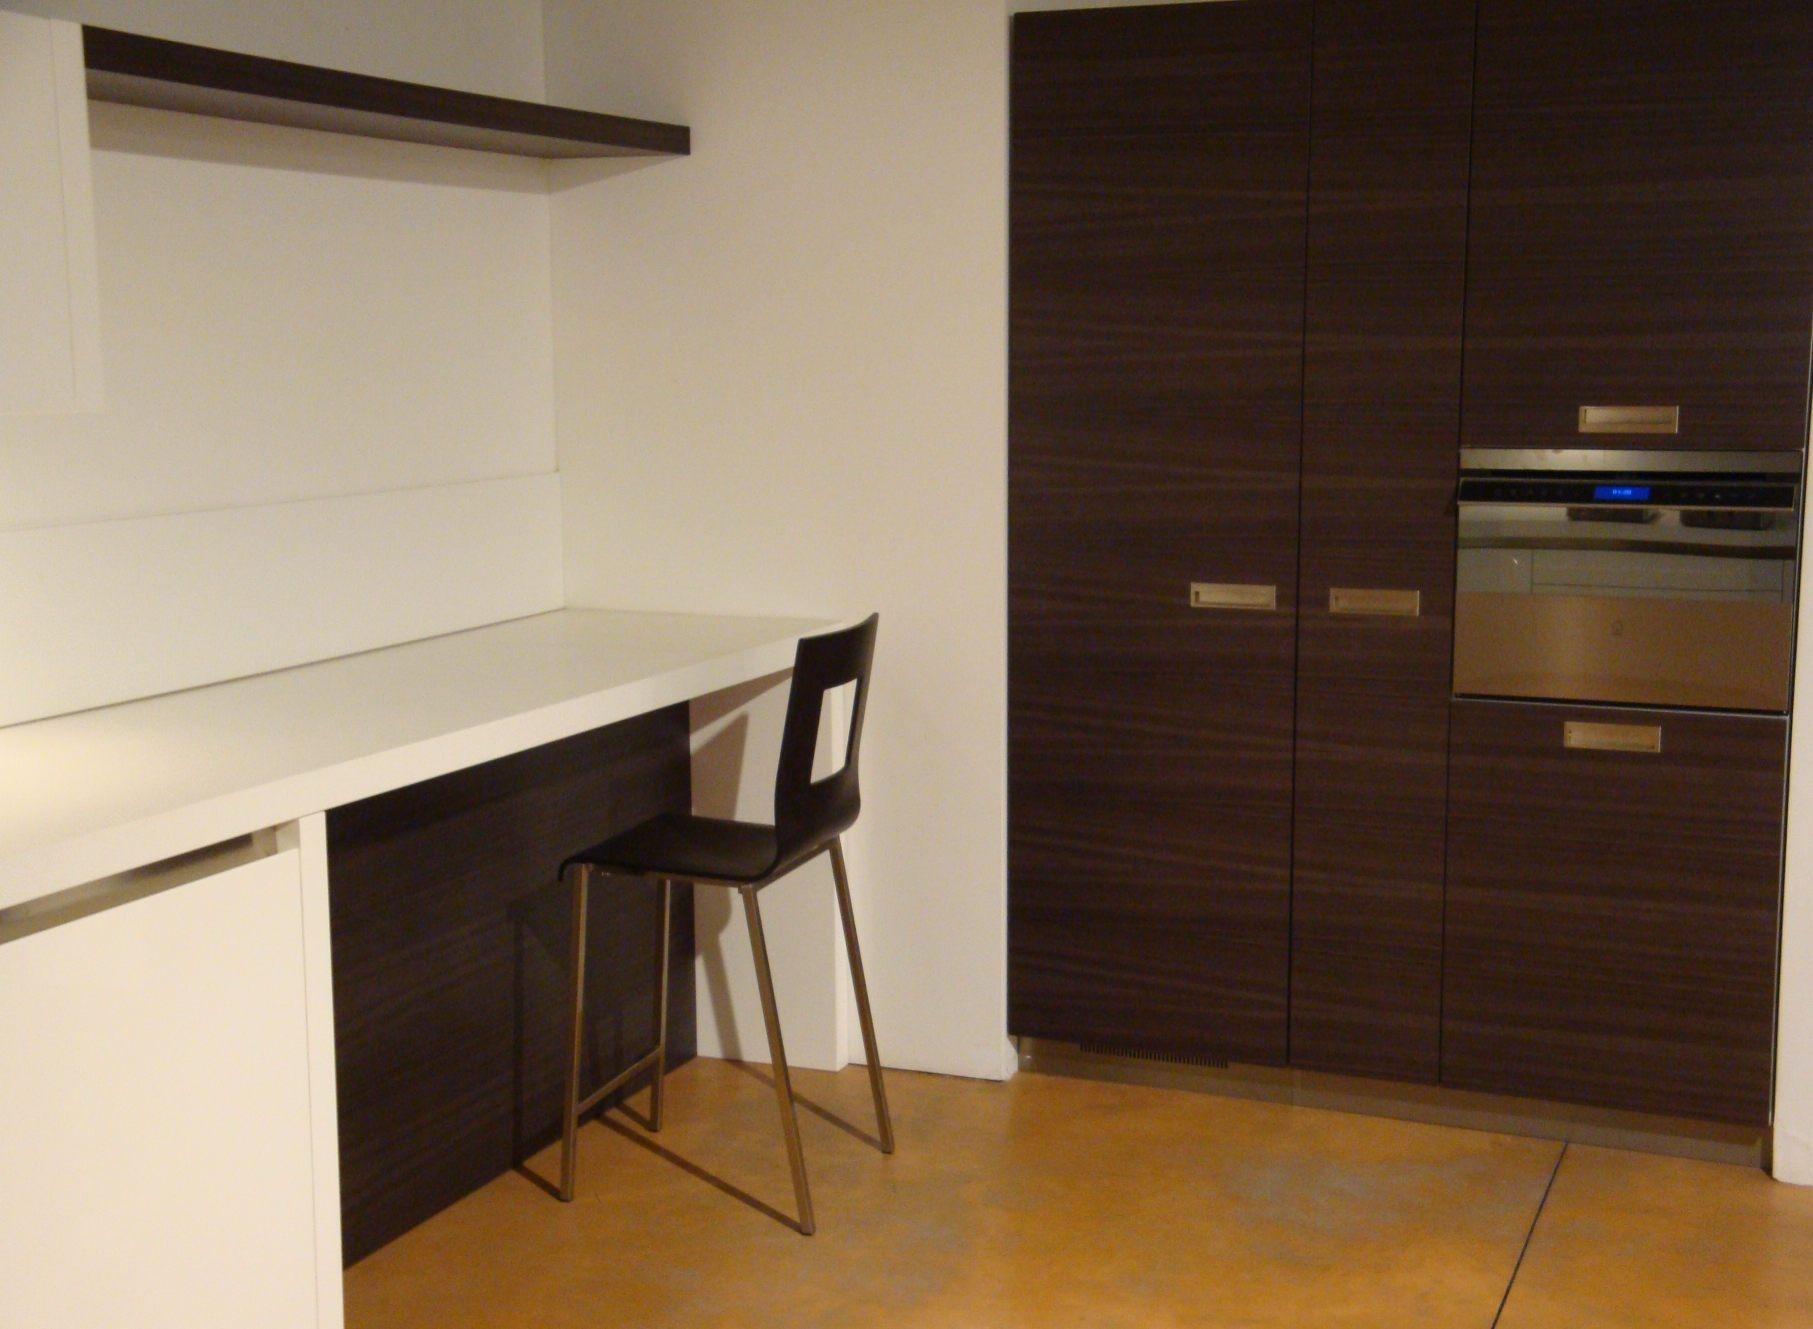 Cucine moderne ad angolo prezzi good with cucine moderne - Cucine ad angolo prezzi ...